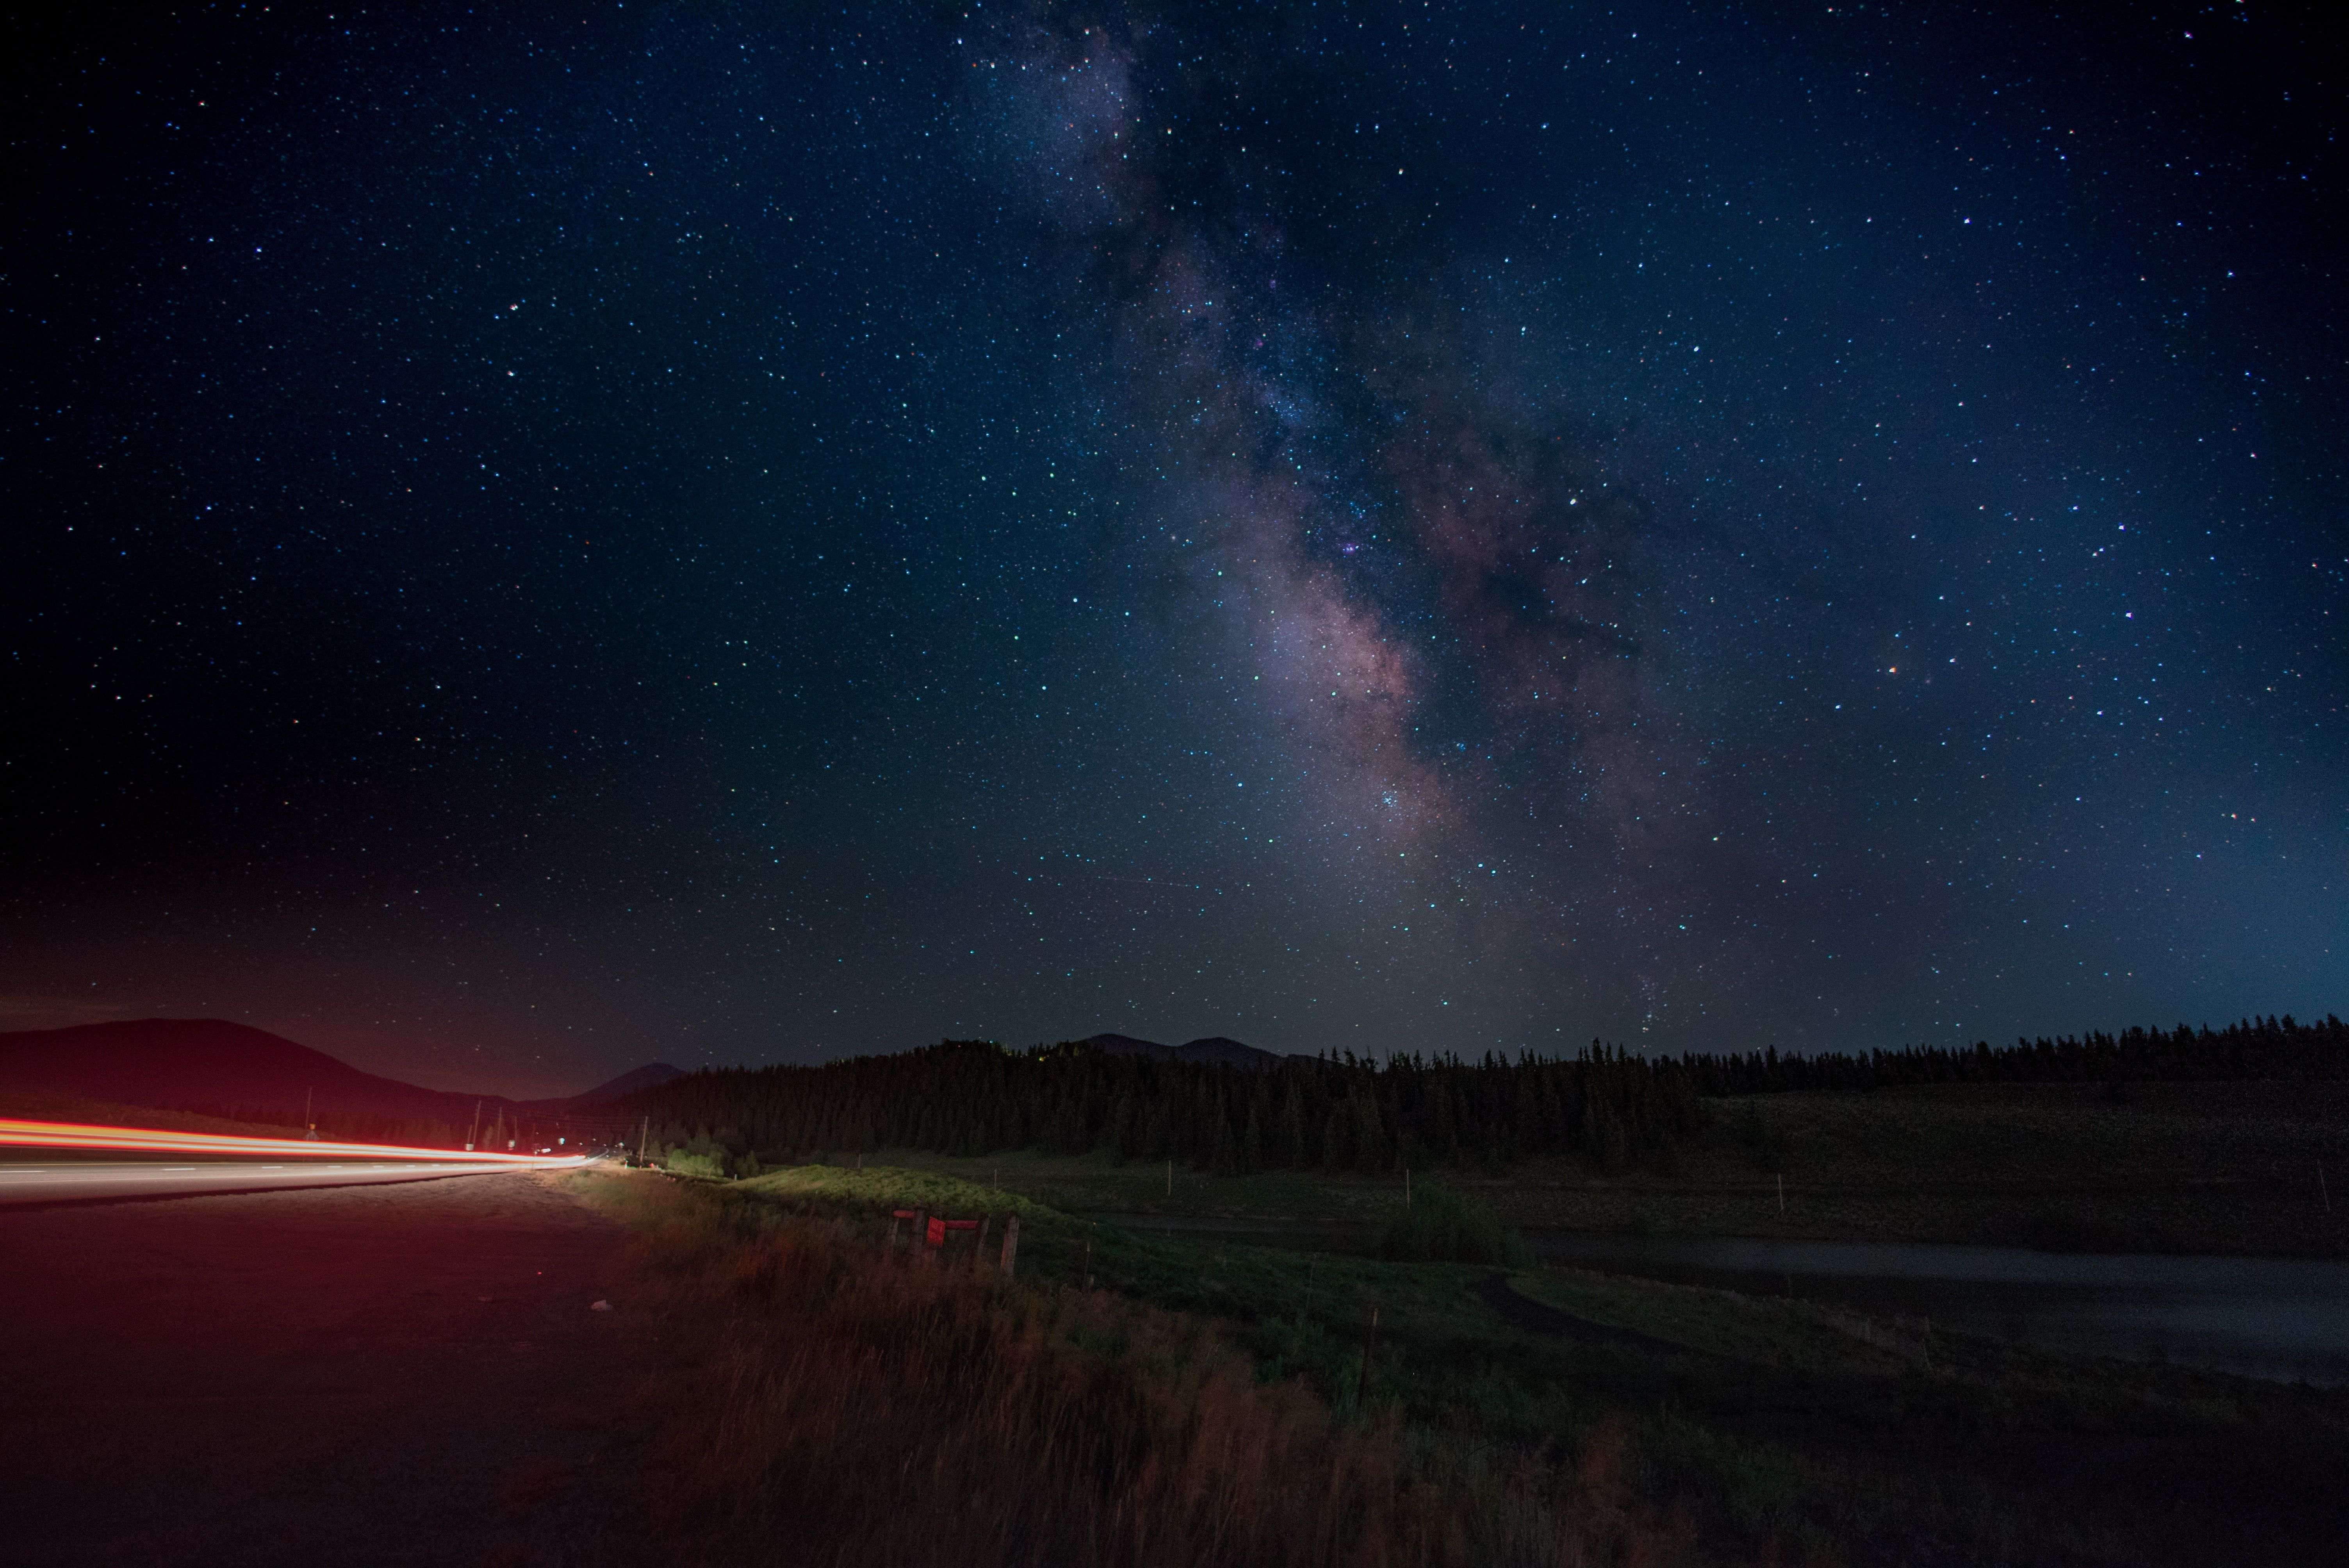 Milky Way Galaxy At Nighttime Road Starry Night Night Sky Lights Car Milky Way Long Exposure Light Trail Milky Way Galaxy Exposure Lights Starry Night Sky